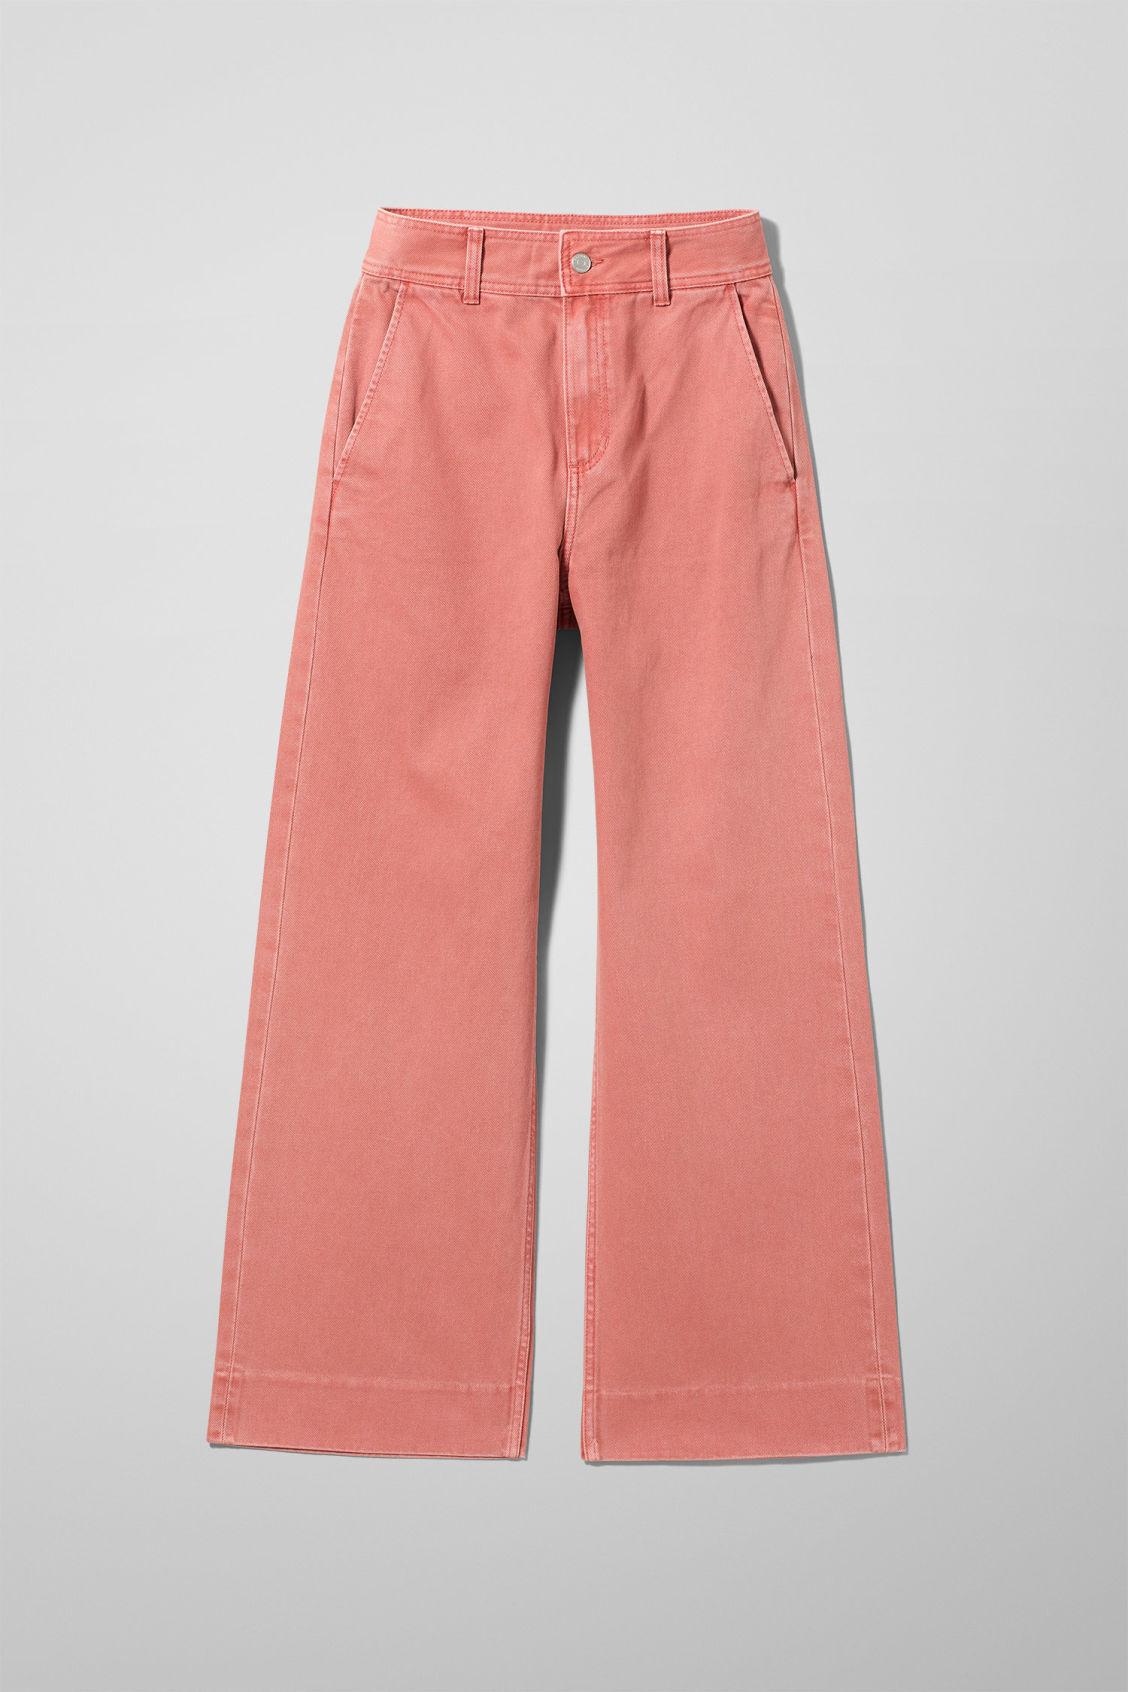 Cory Rose Denim Trousers - Orange-36